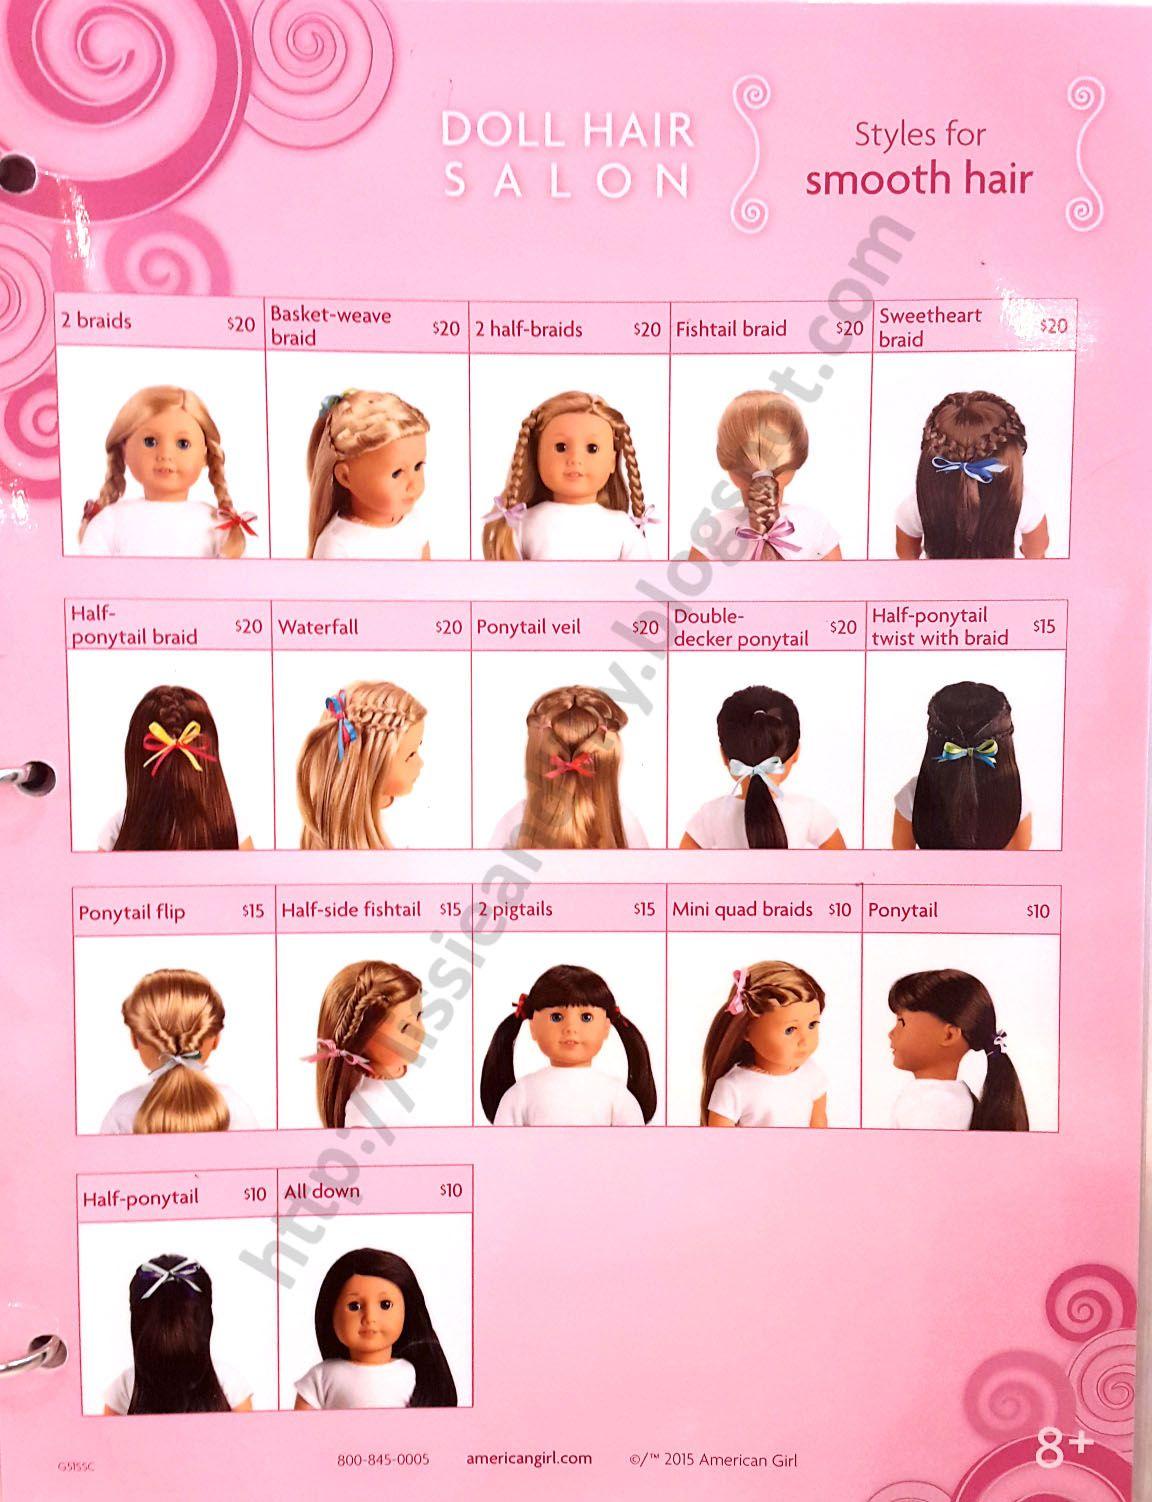 AG Salon Hairstyles   American girl hairstyles, American girl doll ...